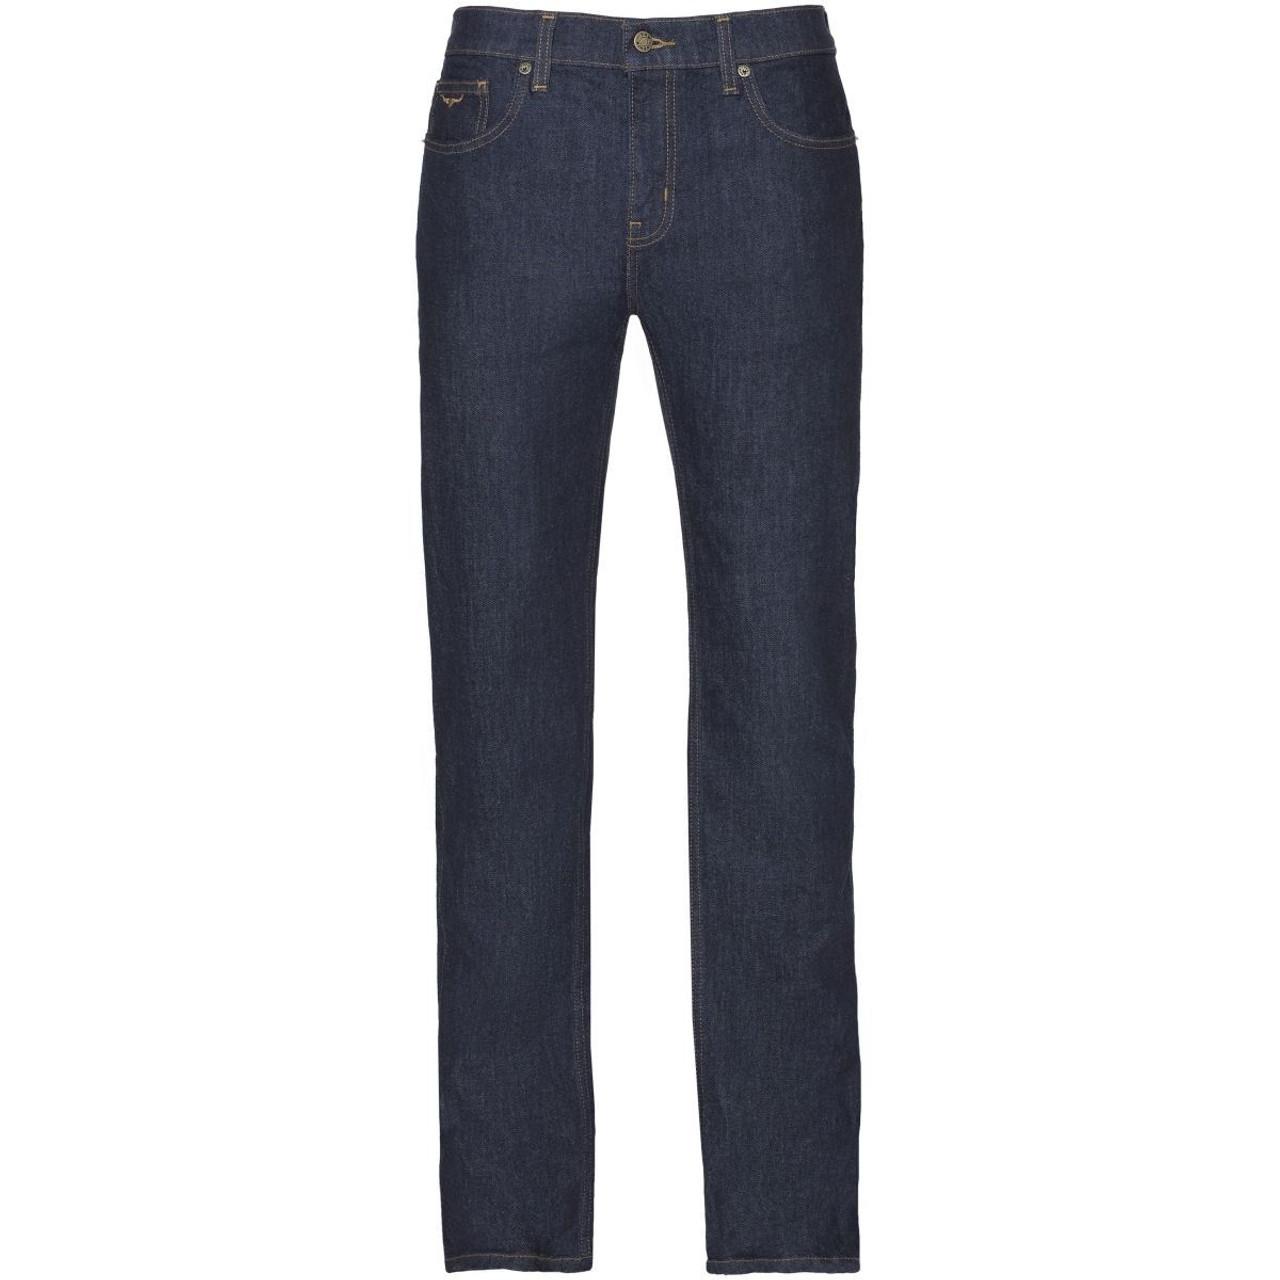 R.M. Williams Ramco Denim Jeans